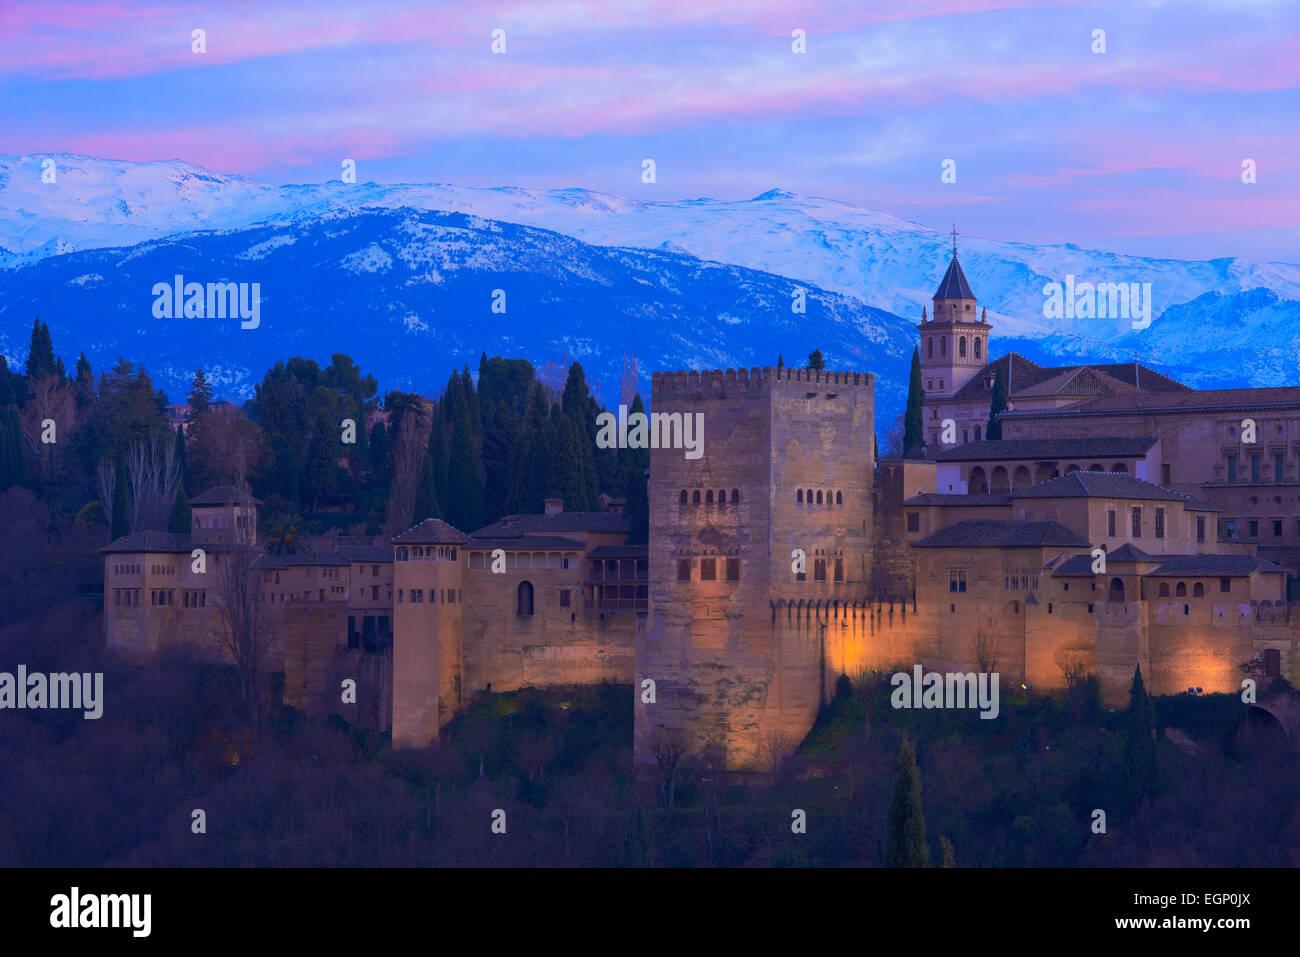 Alhambra, UNESCO World Heritage Site,Sierra Nevada and la Alhambra at Dusk, Granada, Andalusia, Spain - Stock Image